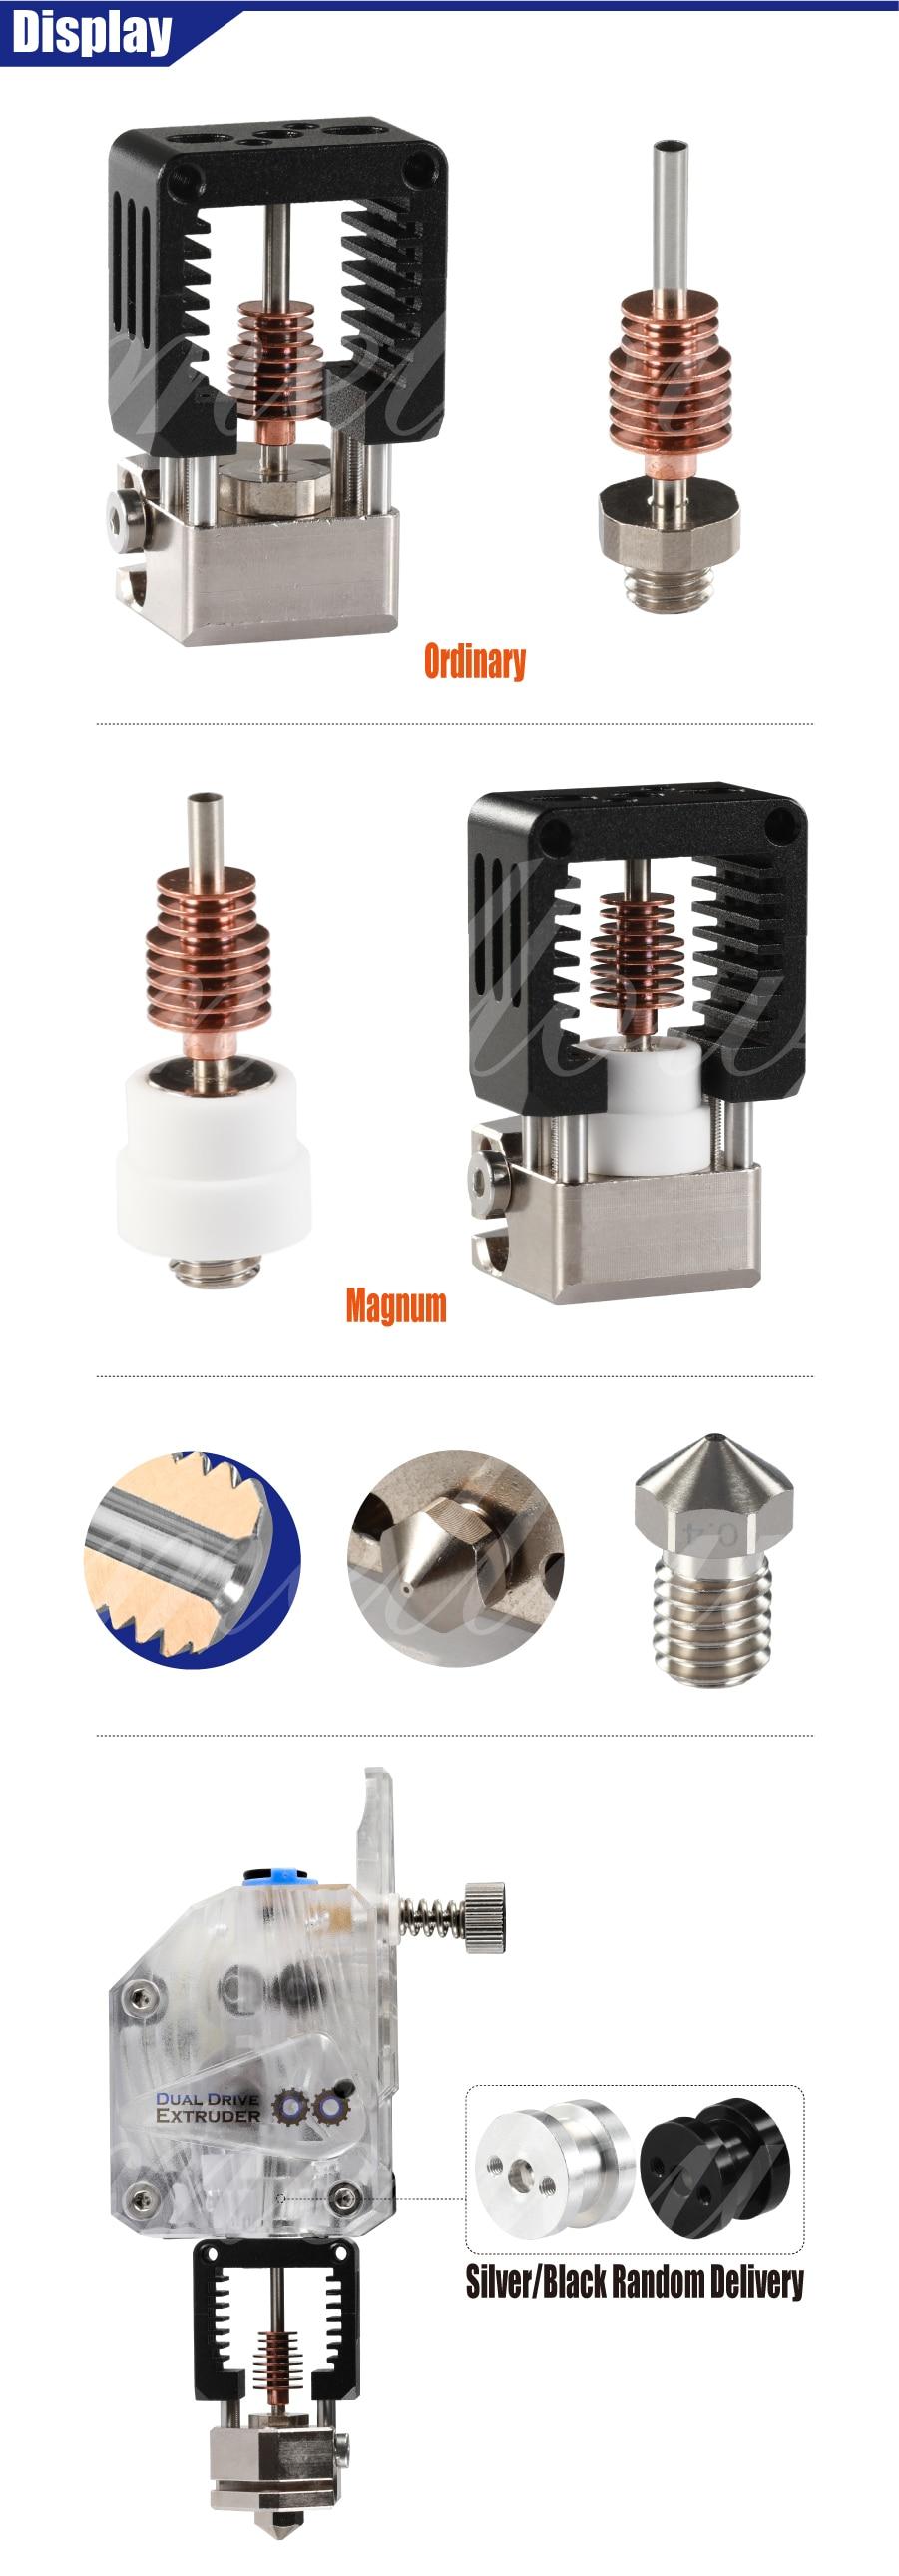 Новейший мягкий металлический NF-Crazy Hotend V6 медный сопло для Ender 3 CR10 Prusa I3 MK3S экструдер экструдер для 3д принтера